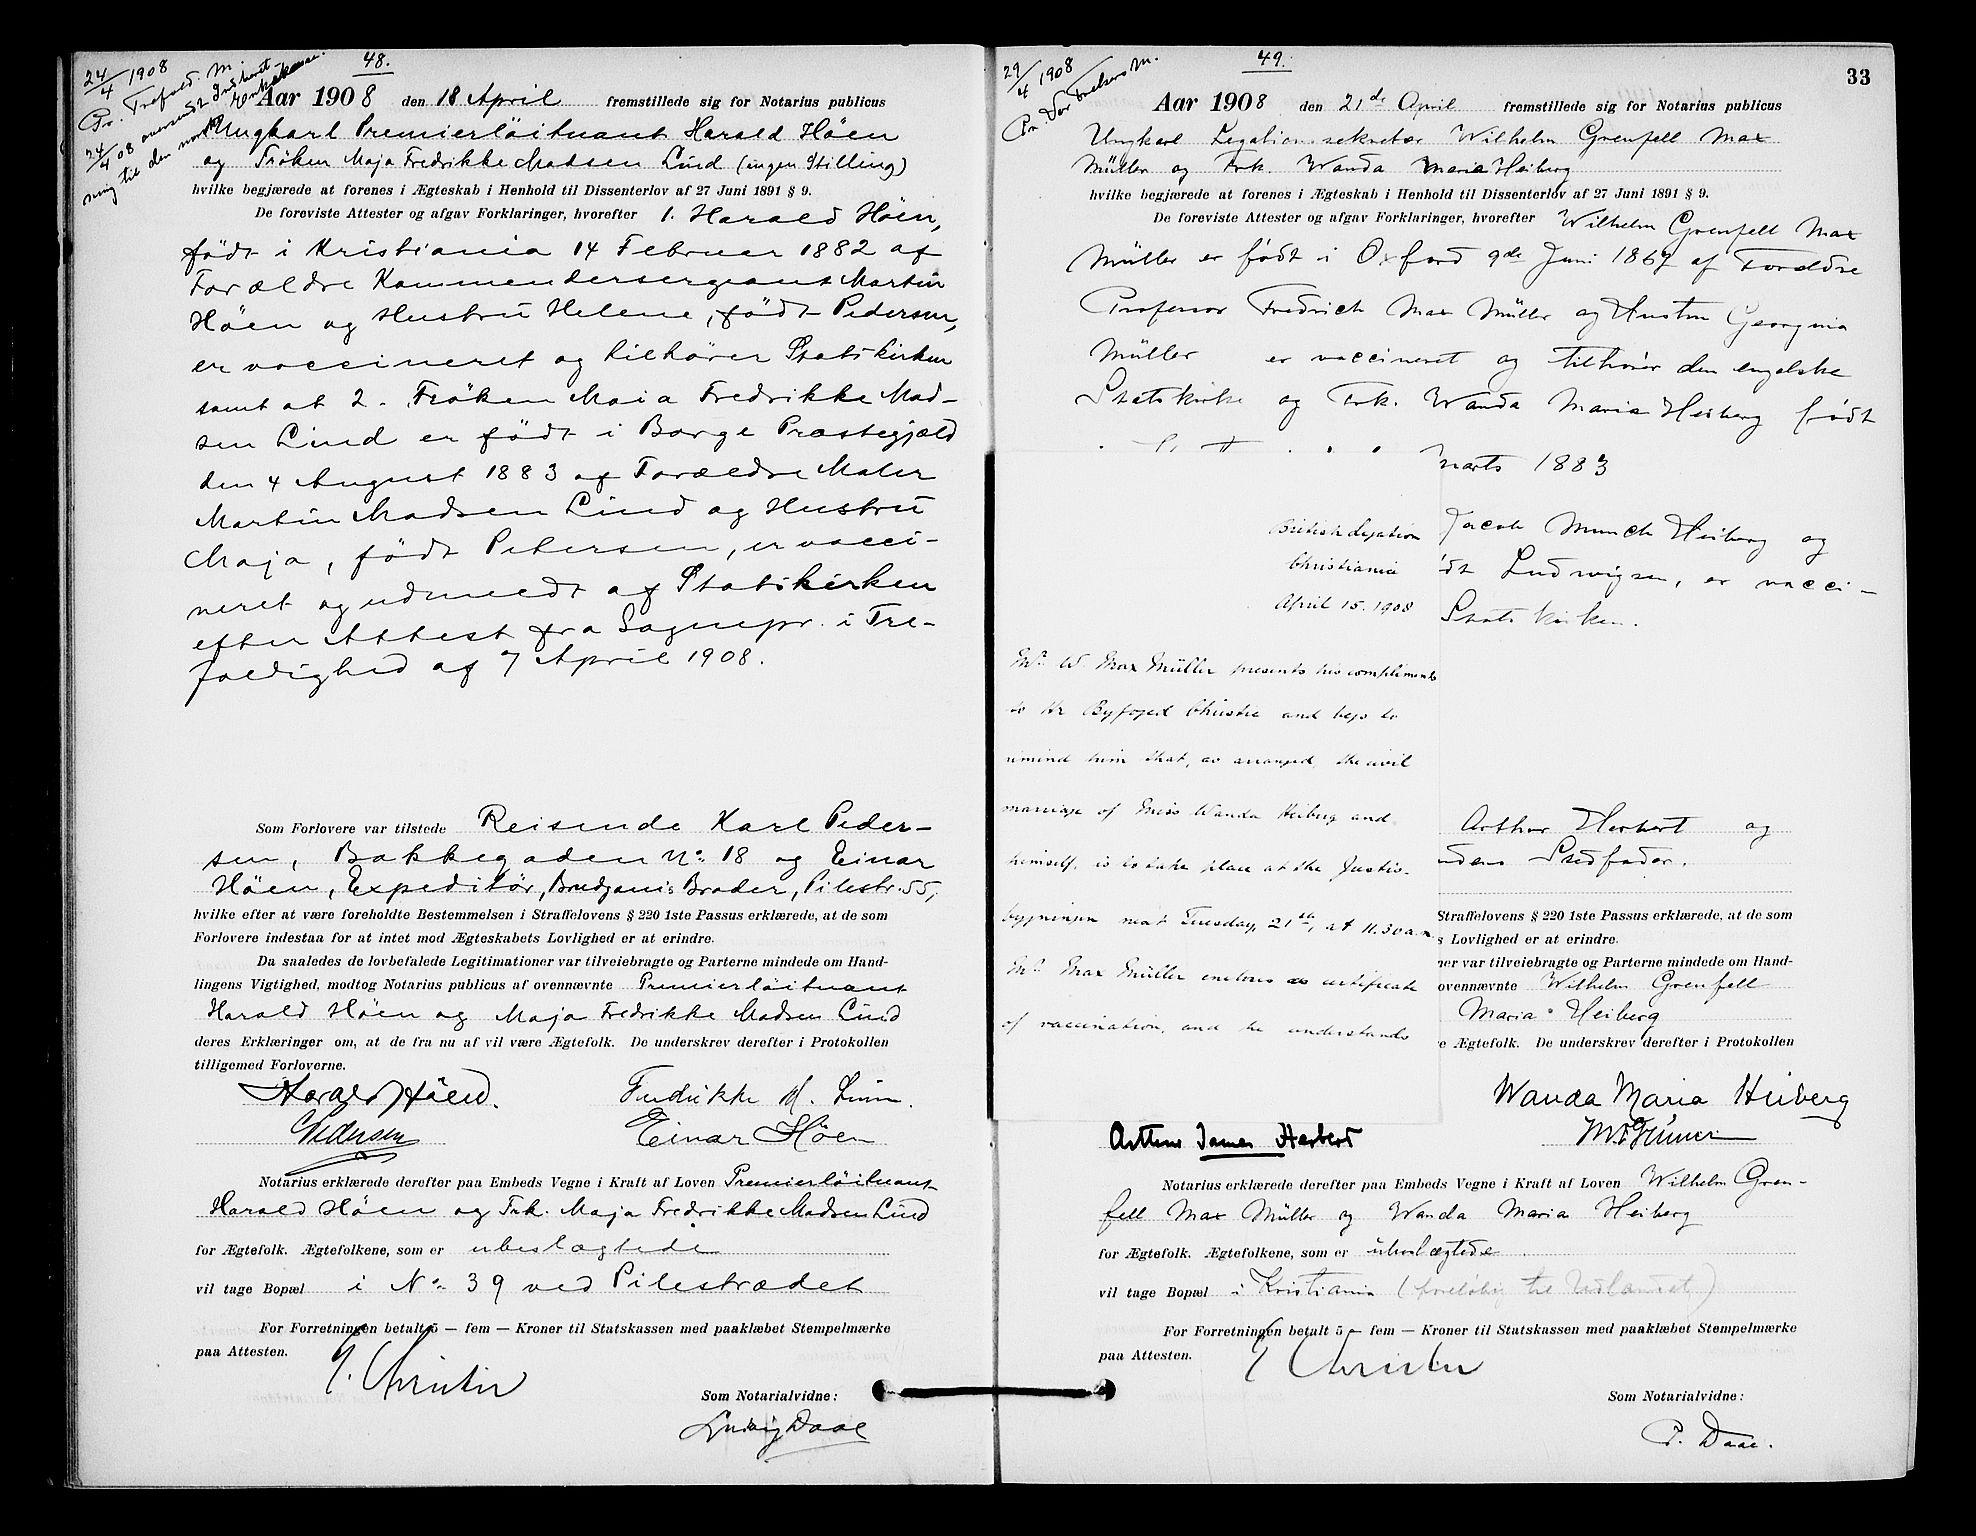 SAO, Oslo byfogd avd. I, L/Lb/Lbb/L0007: Notarialprotokoll, rekke II: Vigsler, 1907-1911, s. 32b-33a